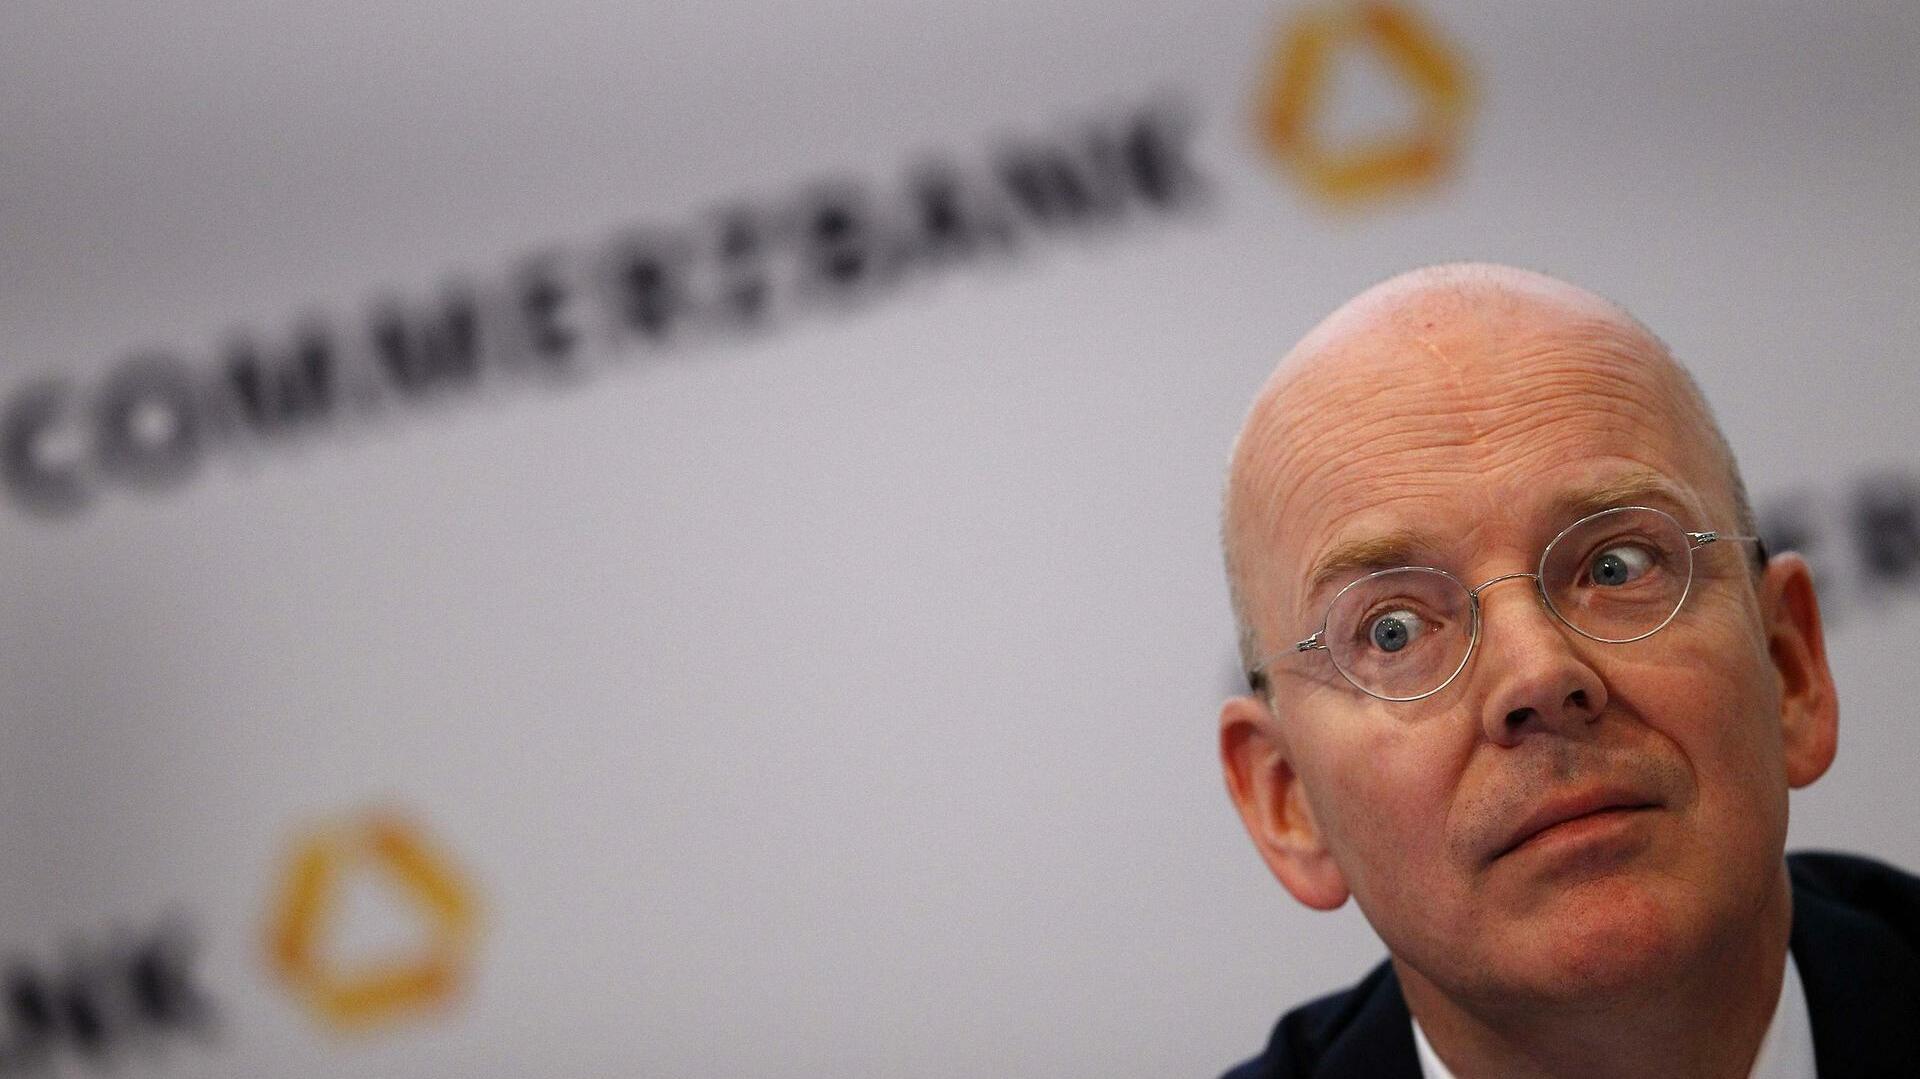 Börsenwert: Die größten europäischen Banken